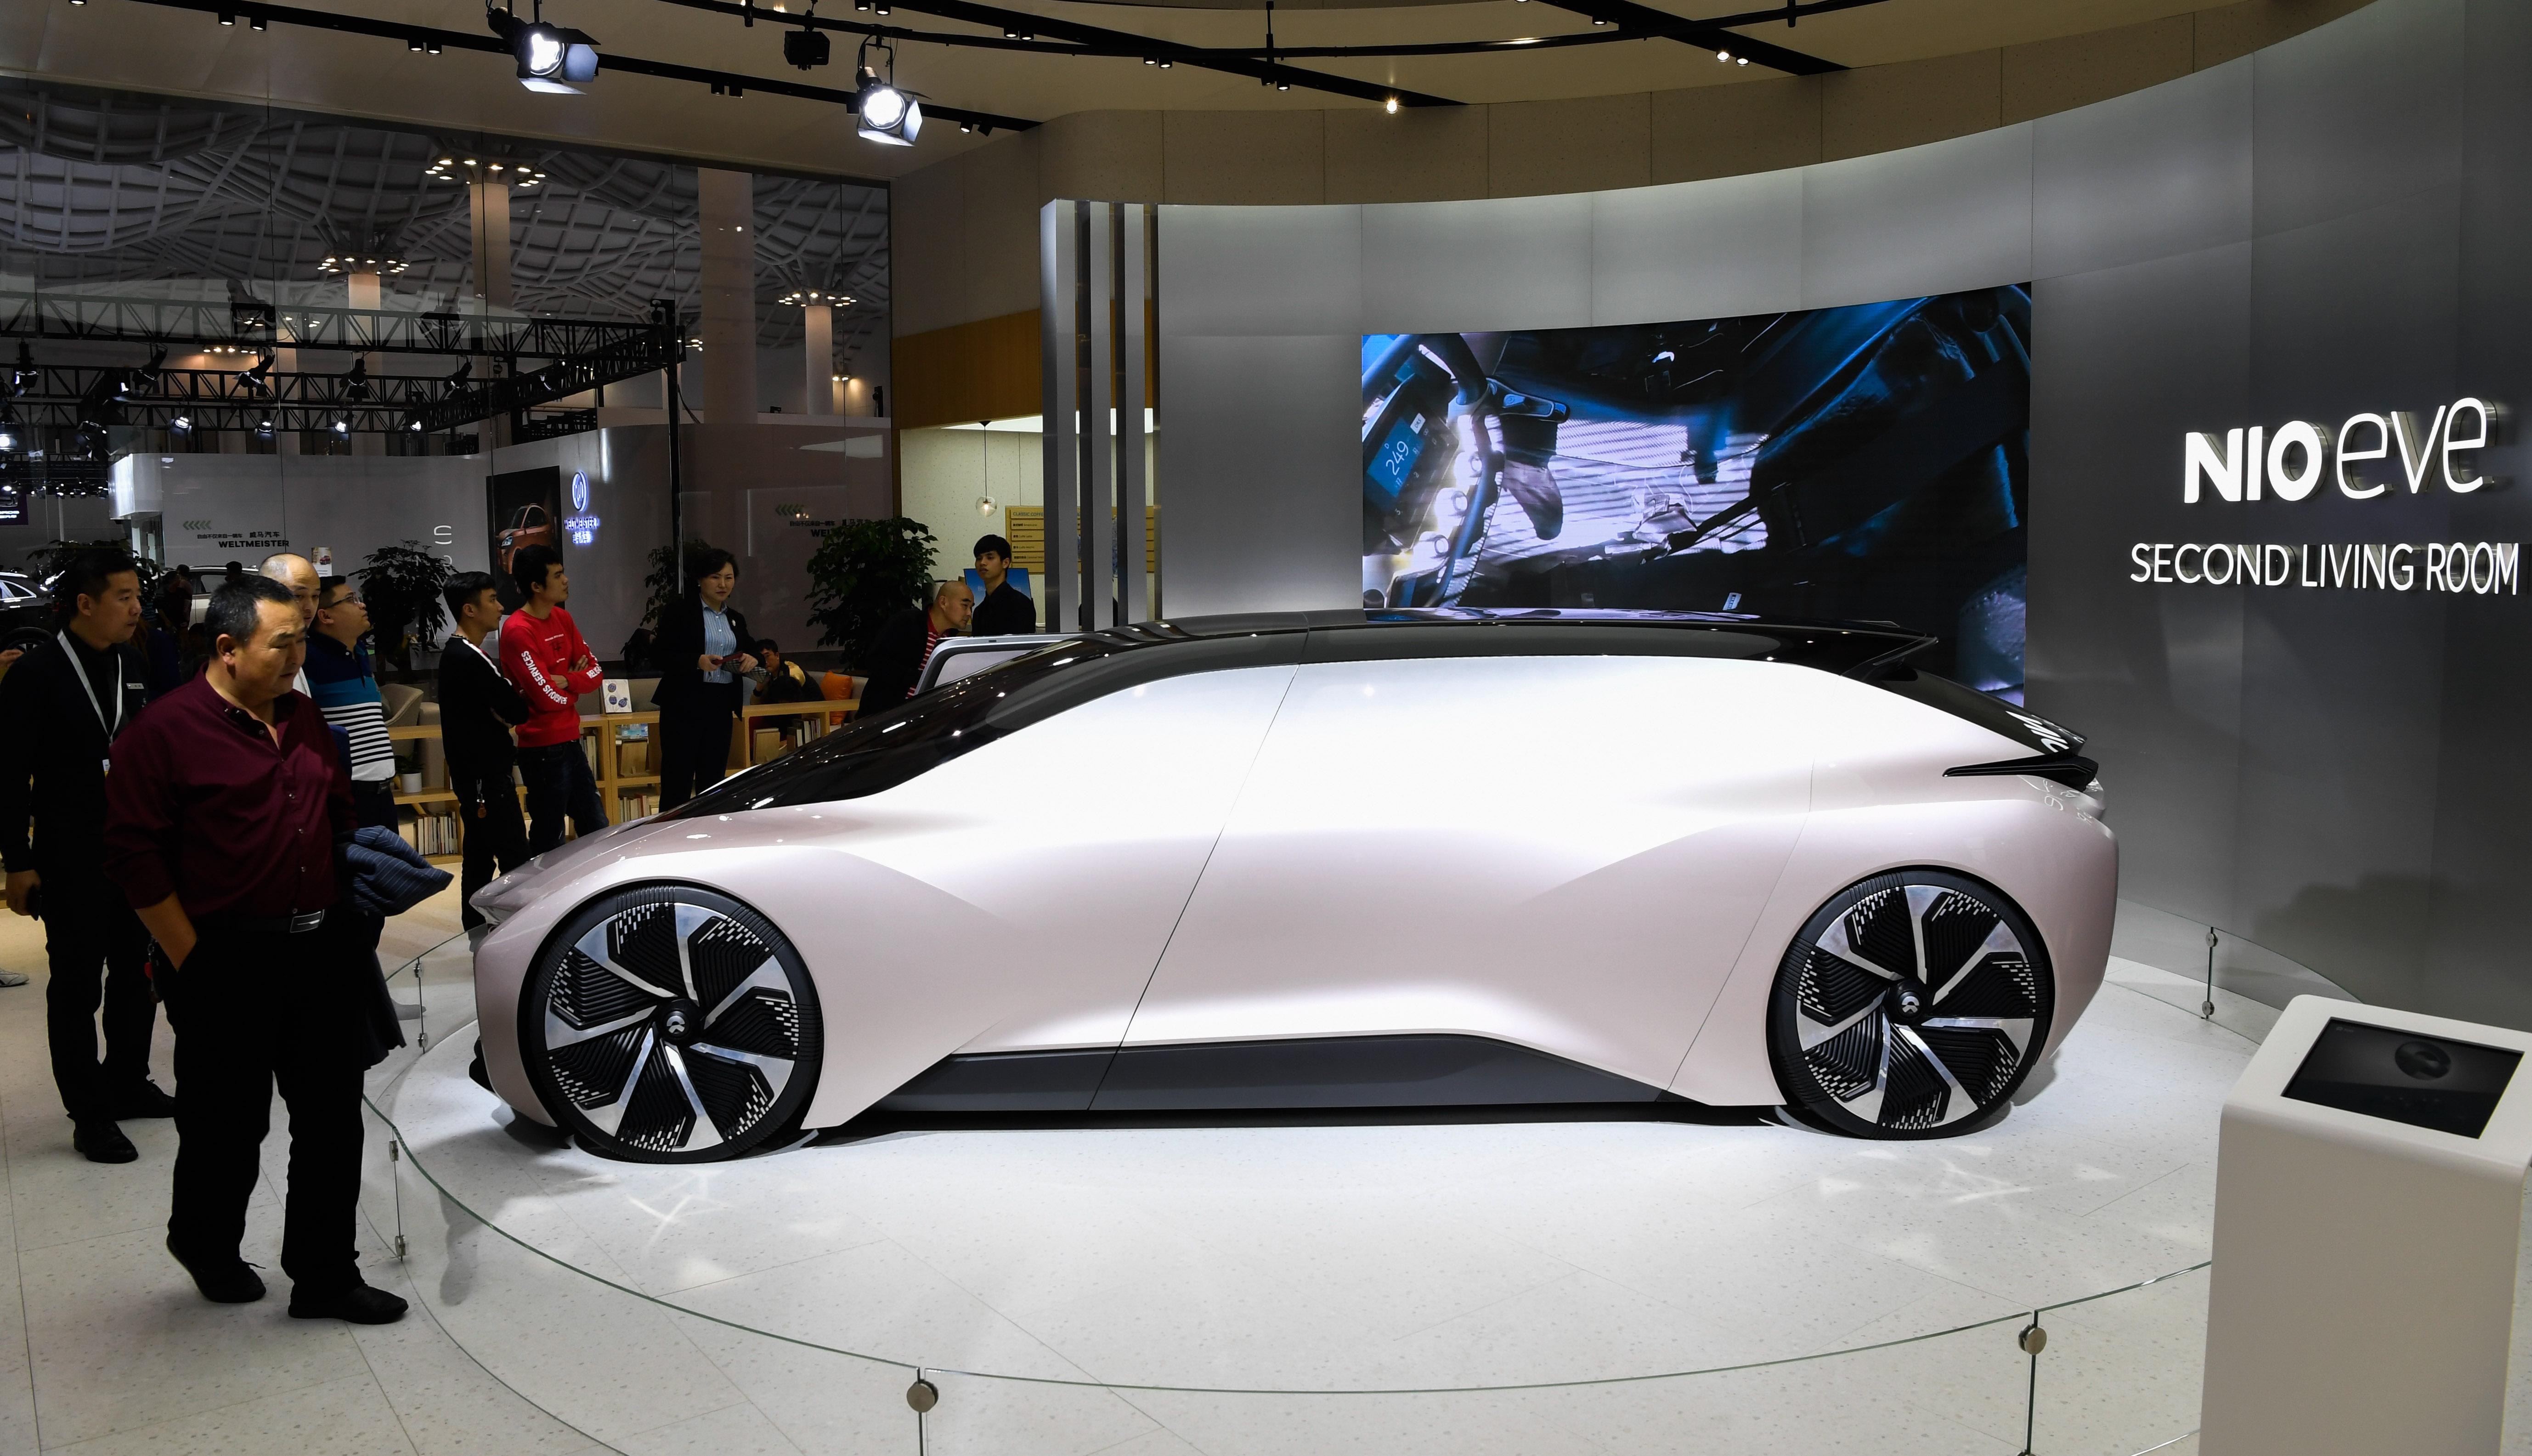 NIOが蘇寧と提携、自動車スマートリテールの新モデル構築へ